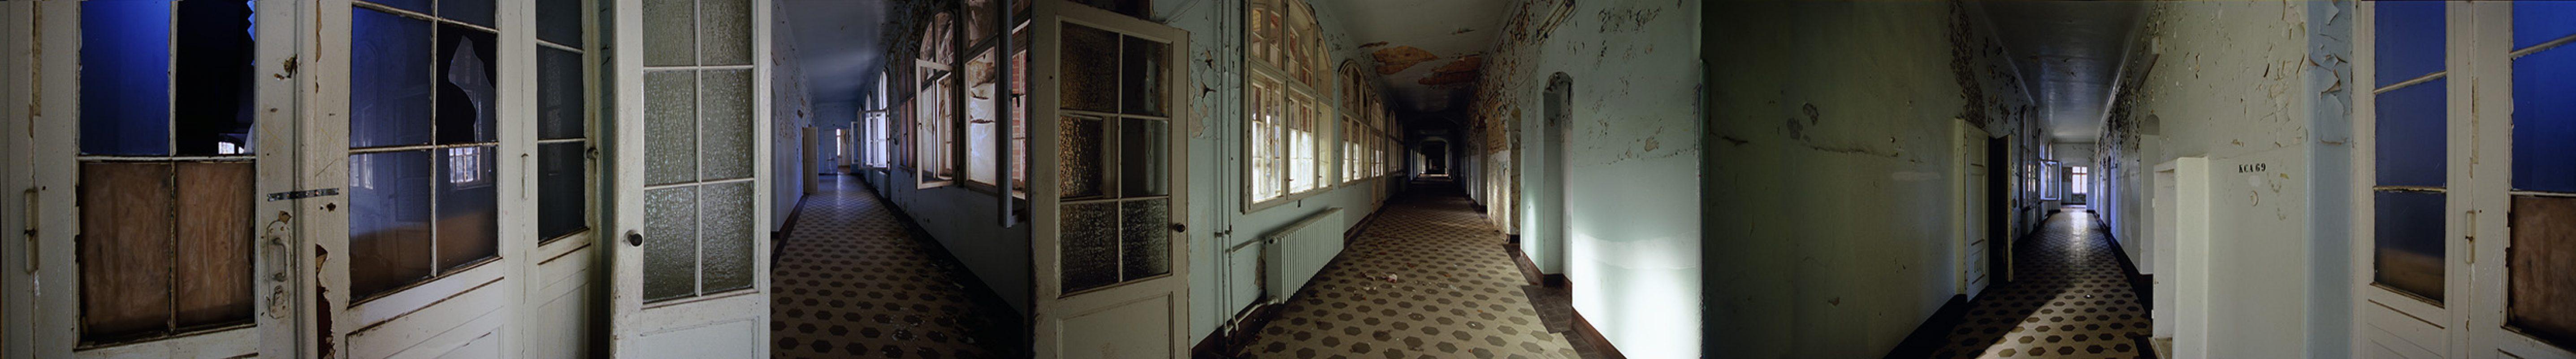 Beelitz-Heilstätten, Kreuzung